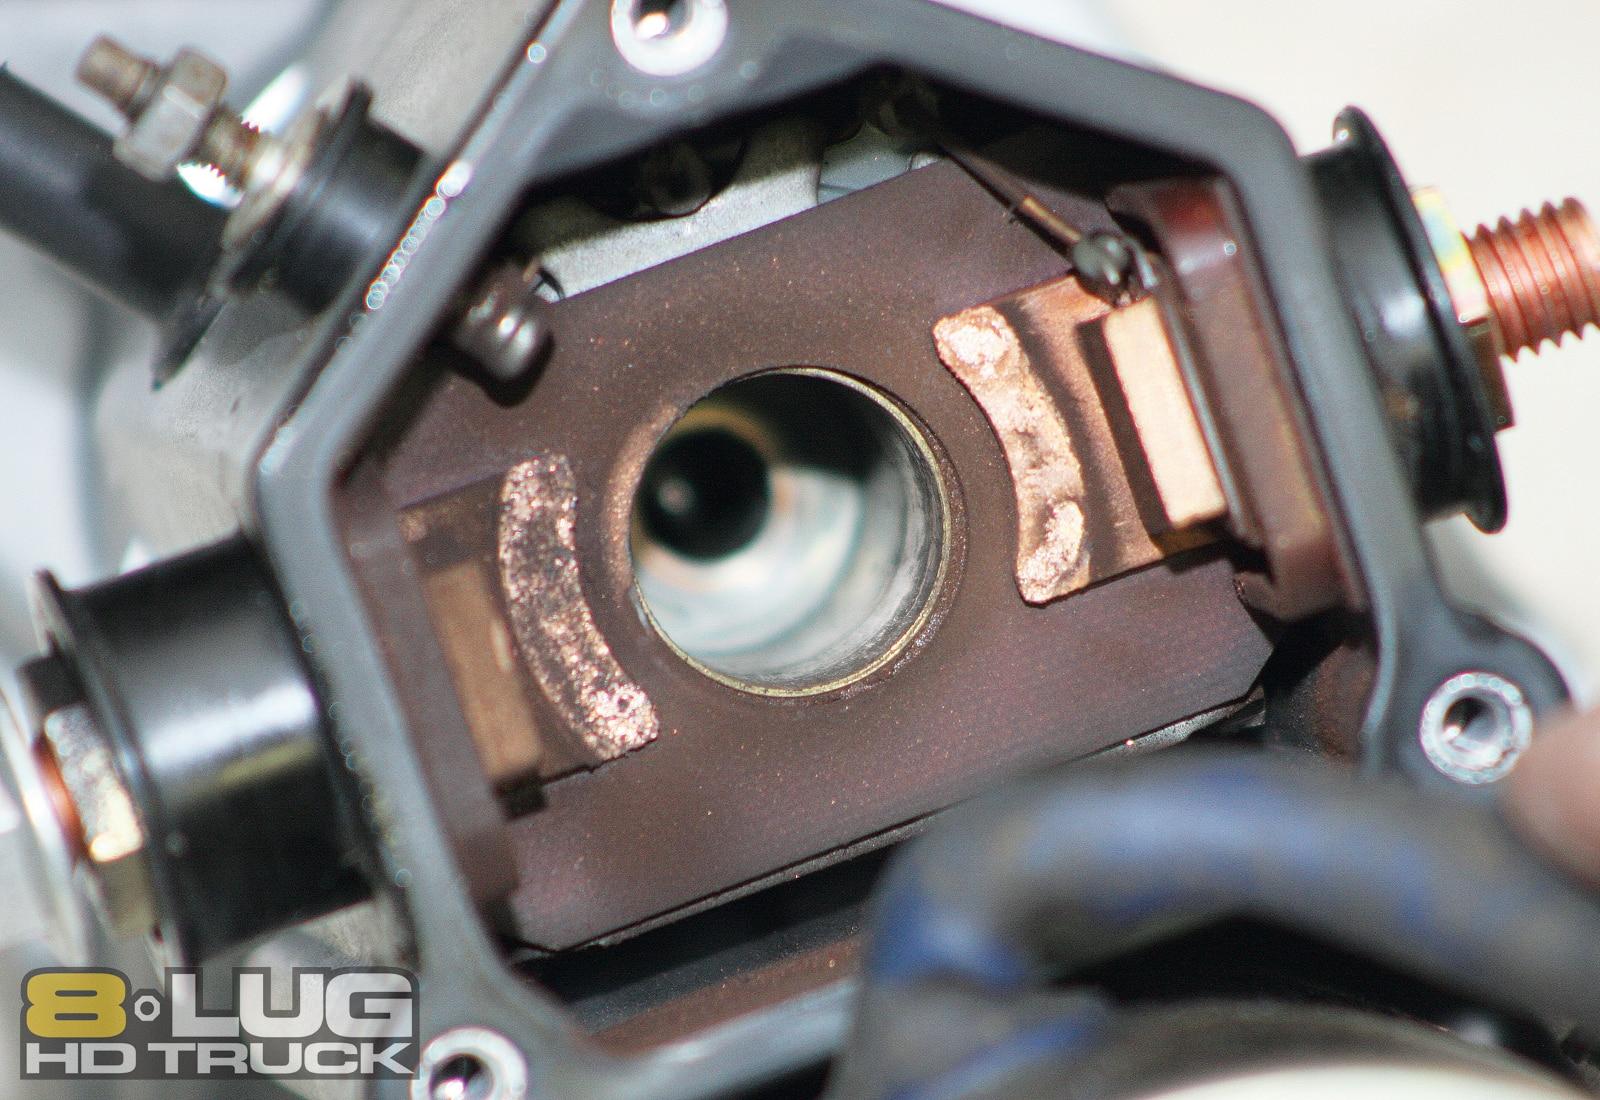 Starter Solenoid Repair - Copper Solenoid Contacts - 8-Lug